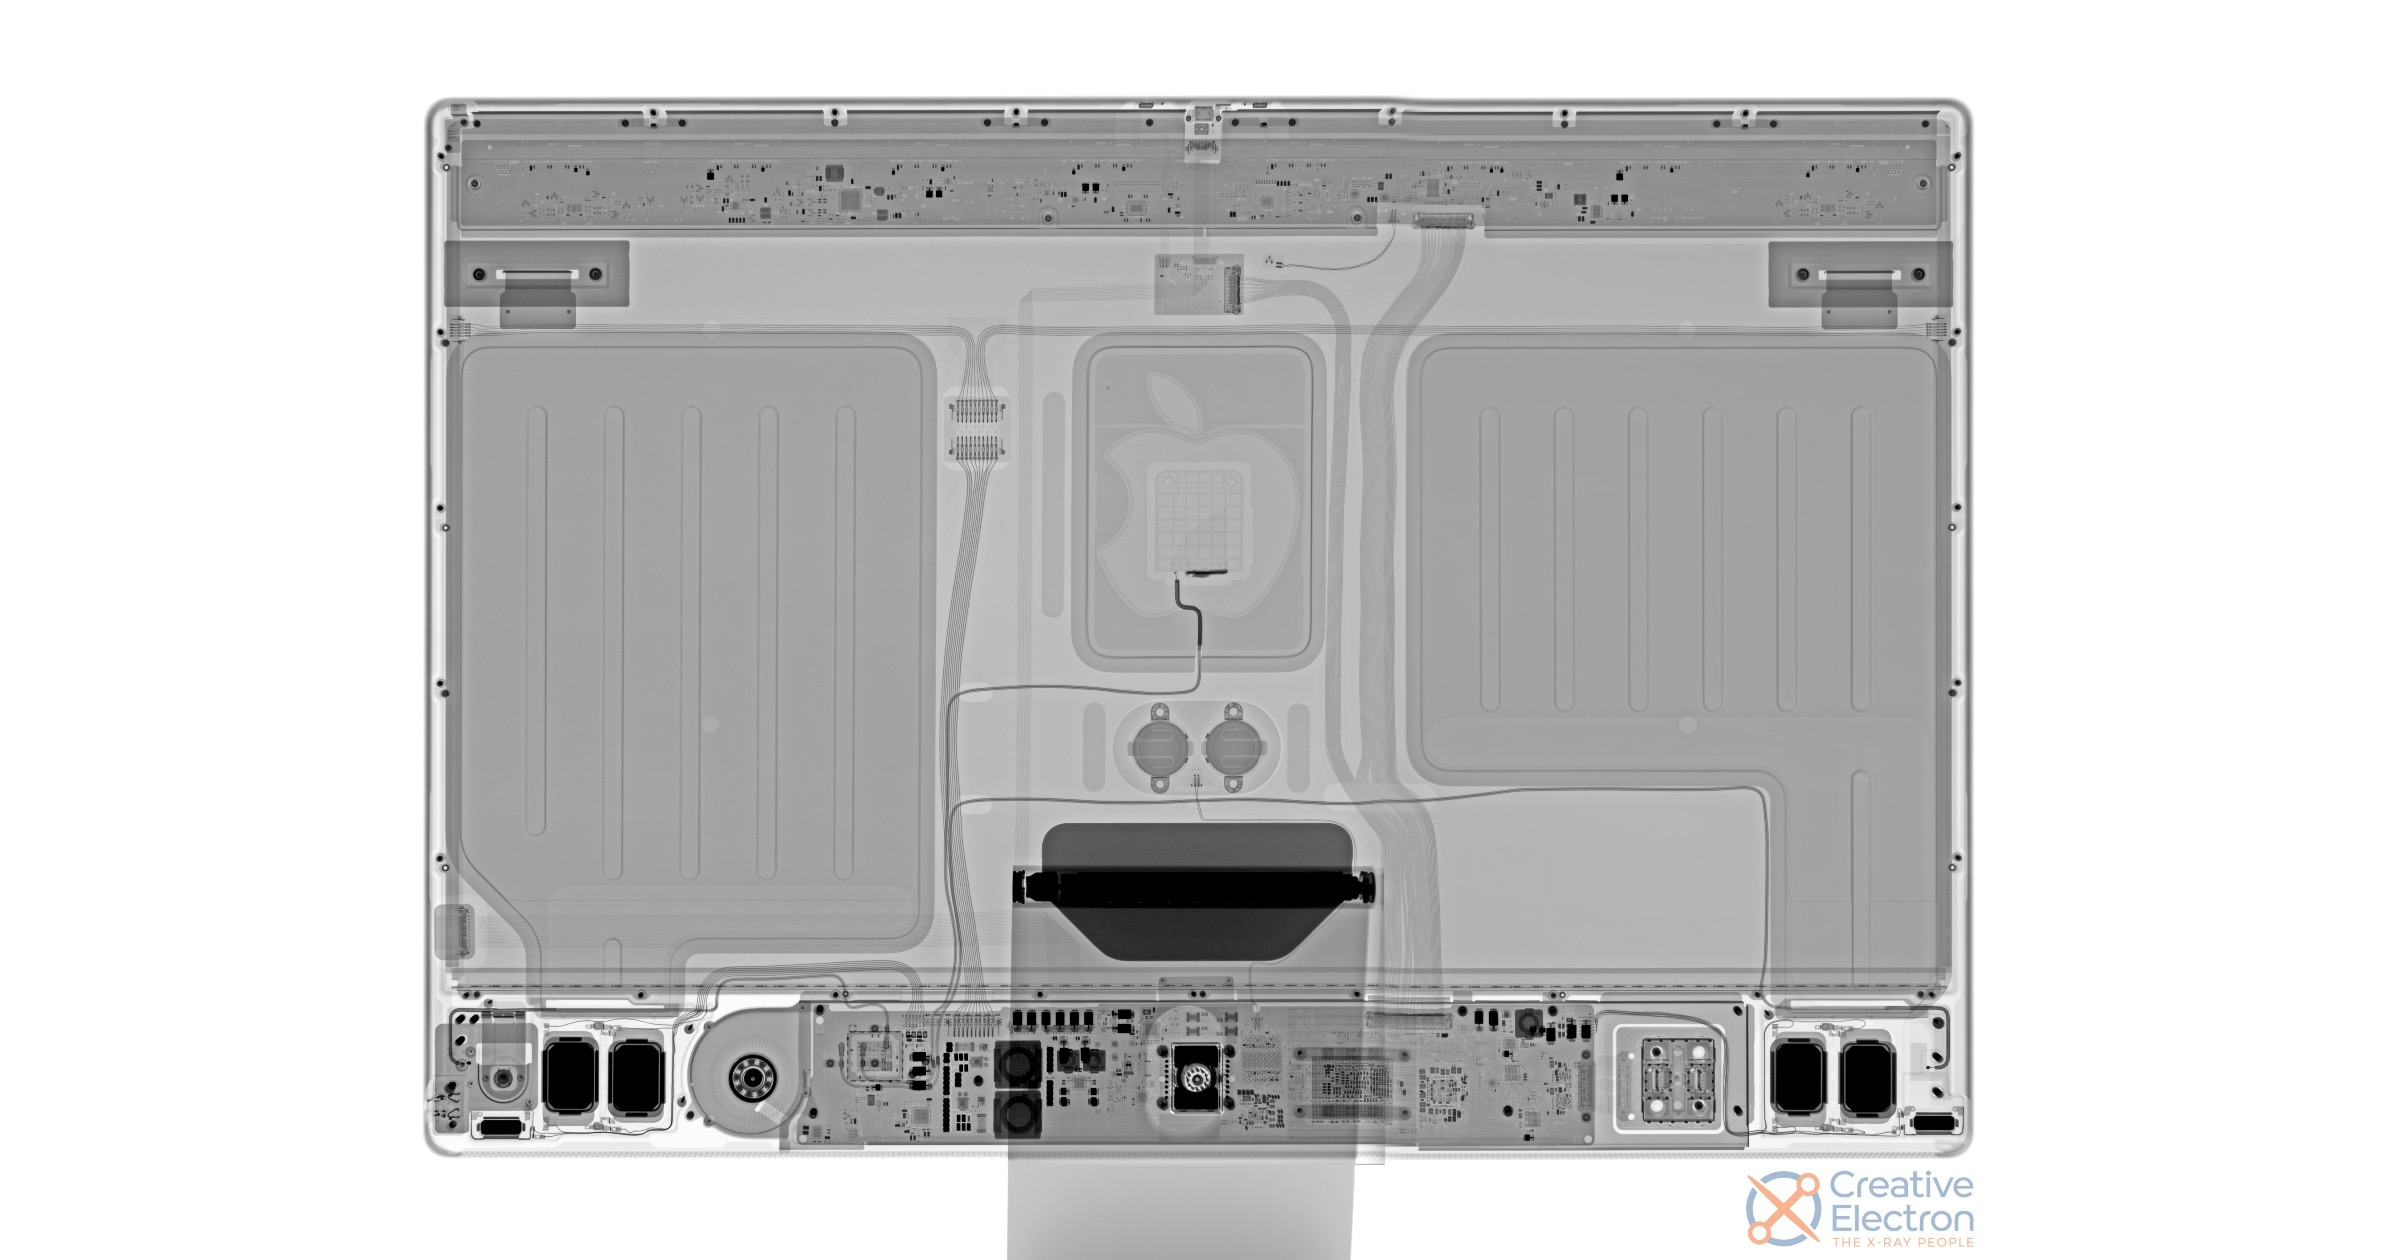 iFixit Posts Teardown of the 2021 iMac 24-inch - The Mac ...